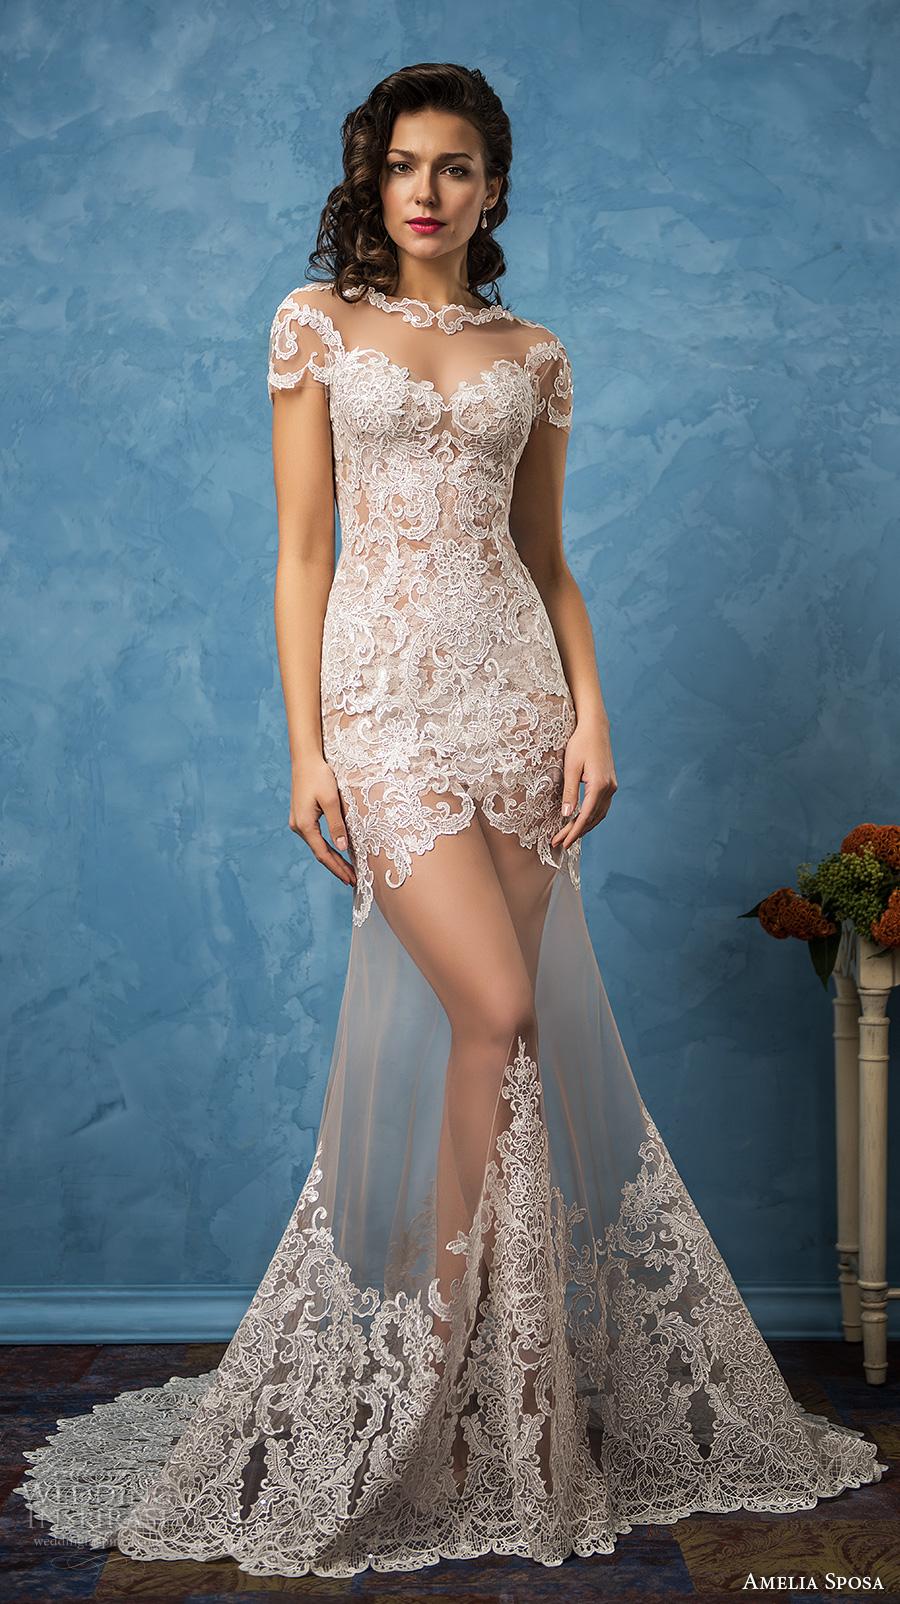 amelia sposa 2017 bridal short sleeves illusion bateau sweetheart neckline full embellishment elegant trumpet wedding dress illusion back chapel train (solange) mv